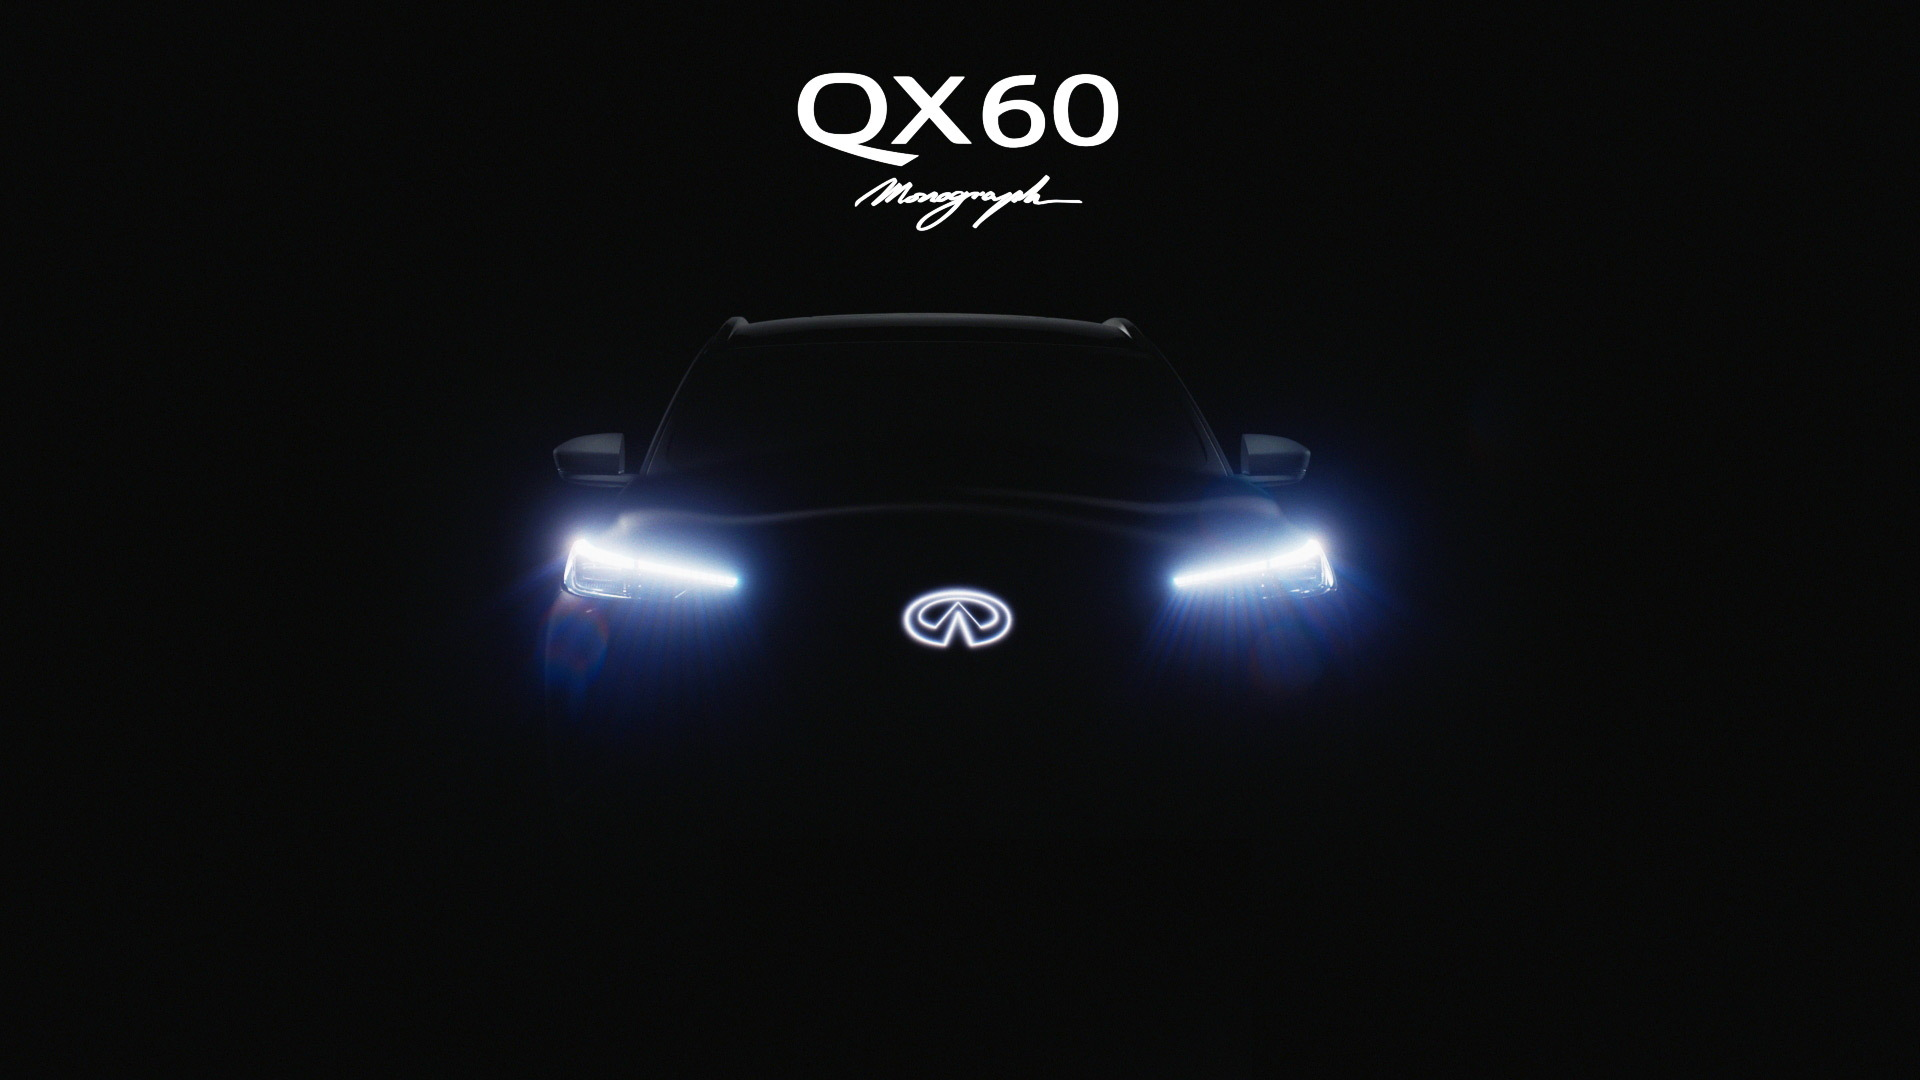 Teaser for Infiniti QX60 Monograph concept debuting September 24, 2020